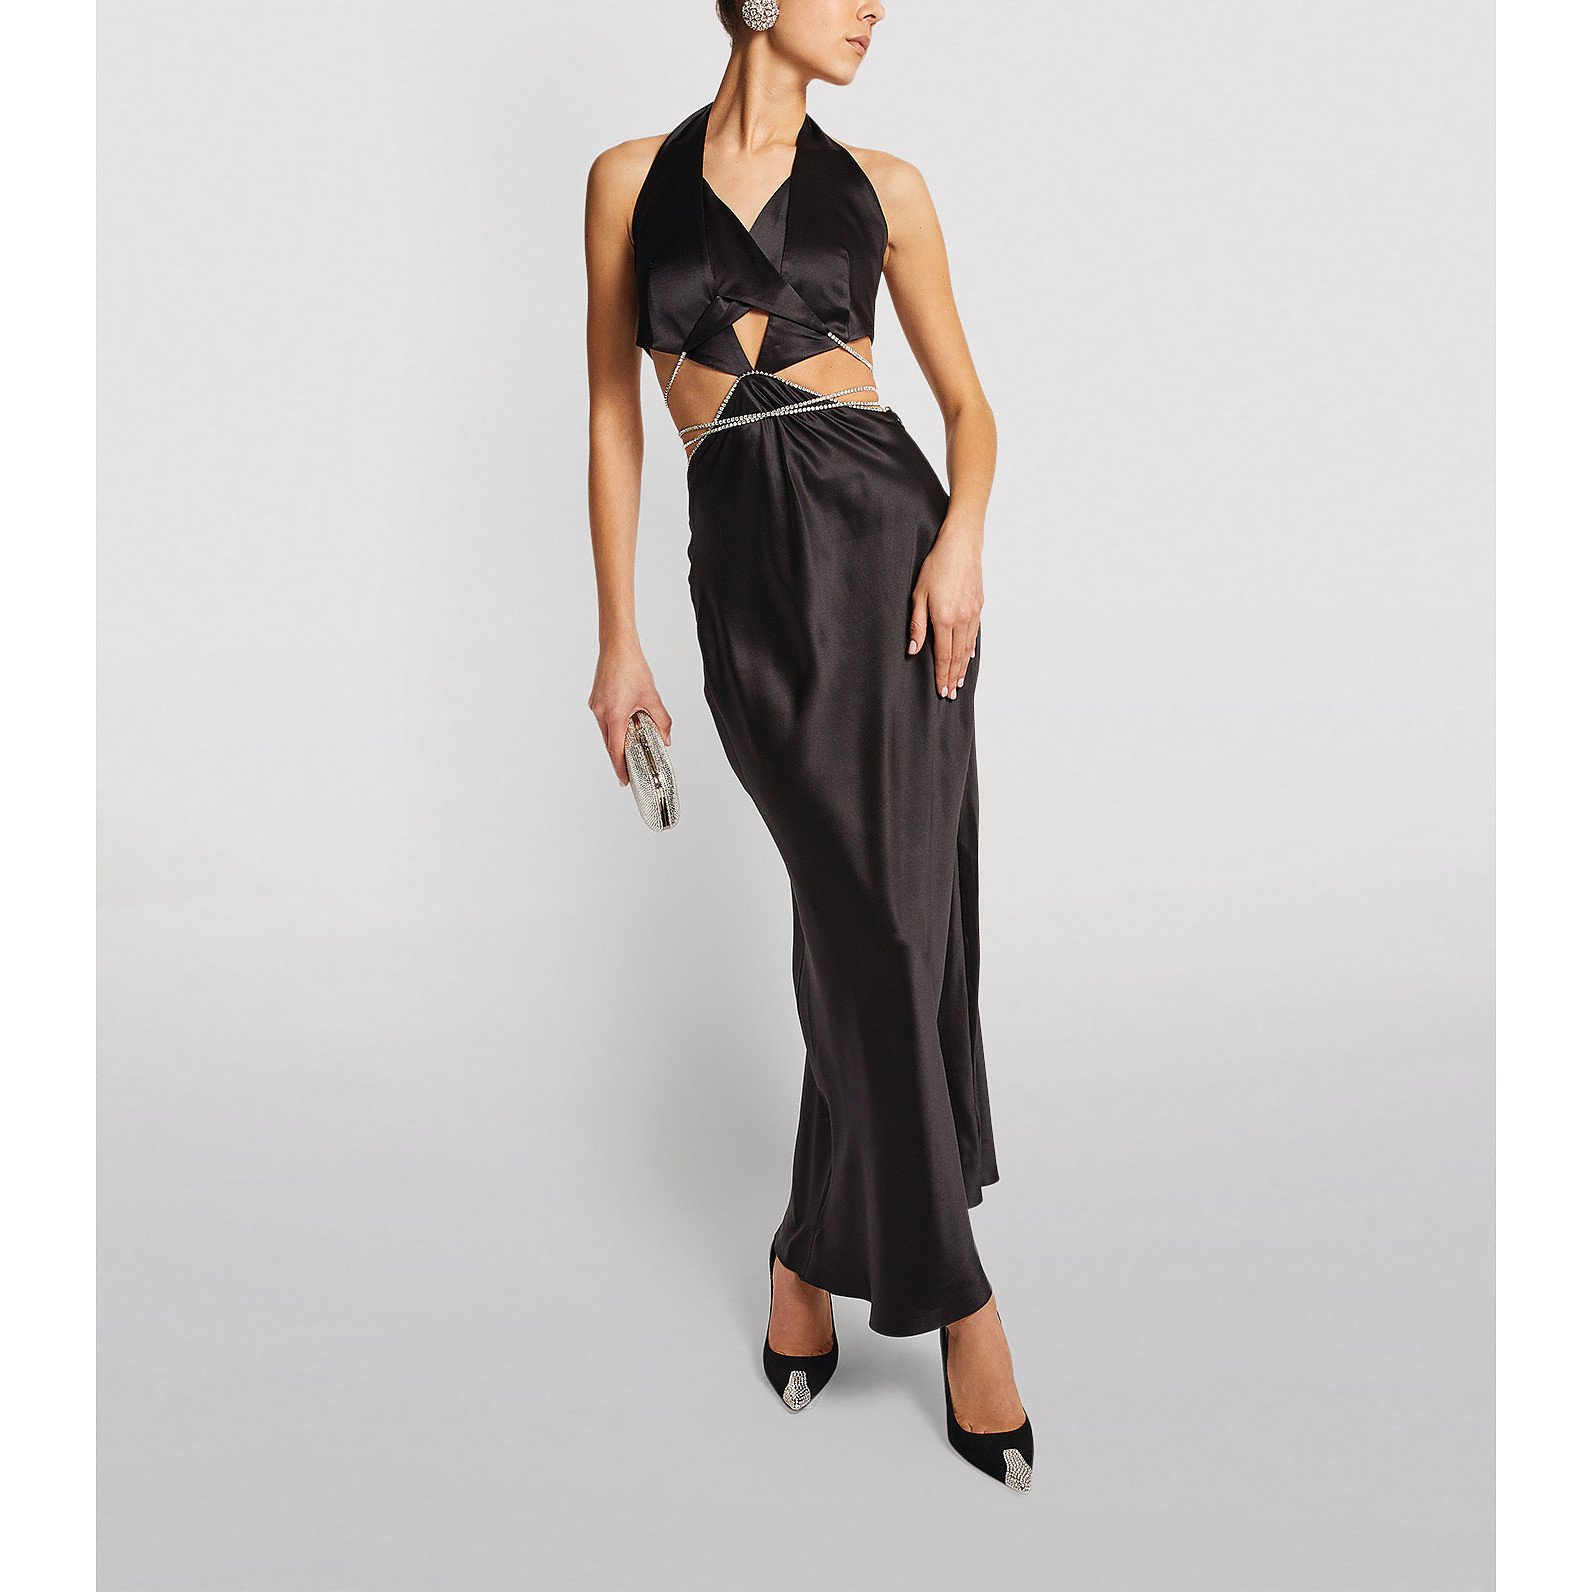 Michael Lo Sordo Alexa Crystal-Embellished Cut-Out Dress